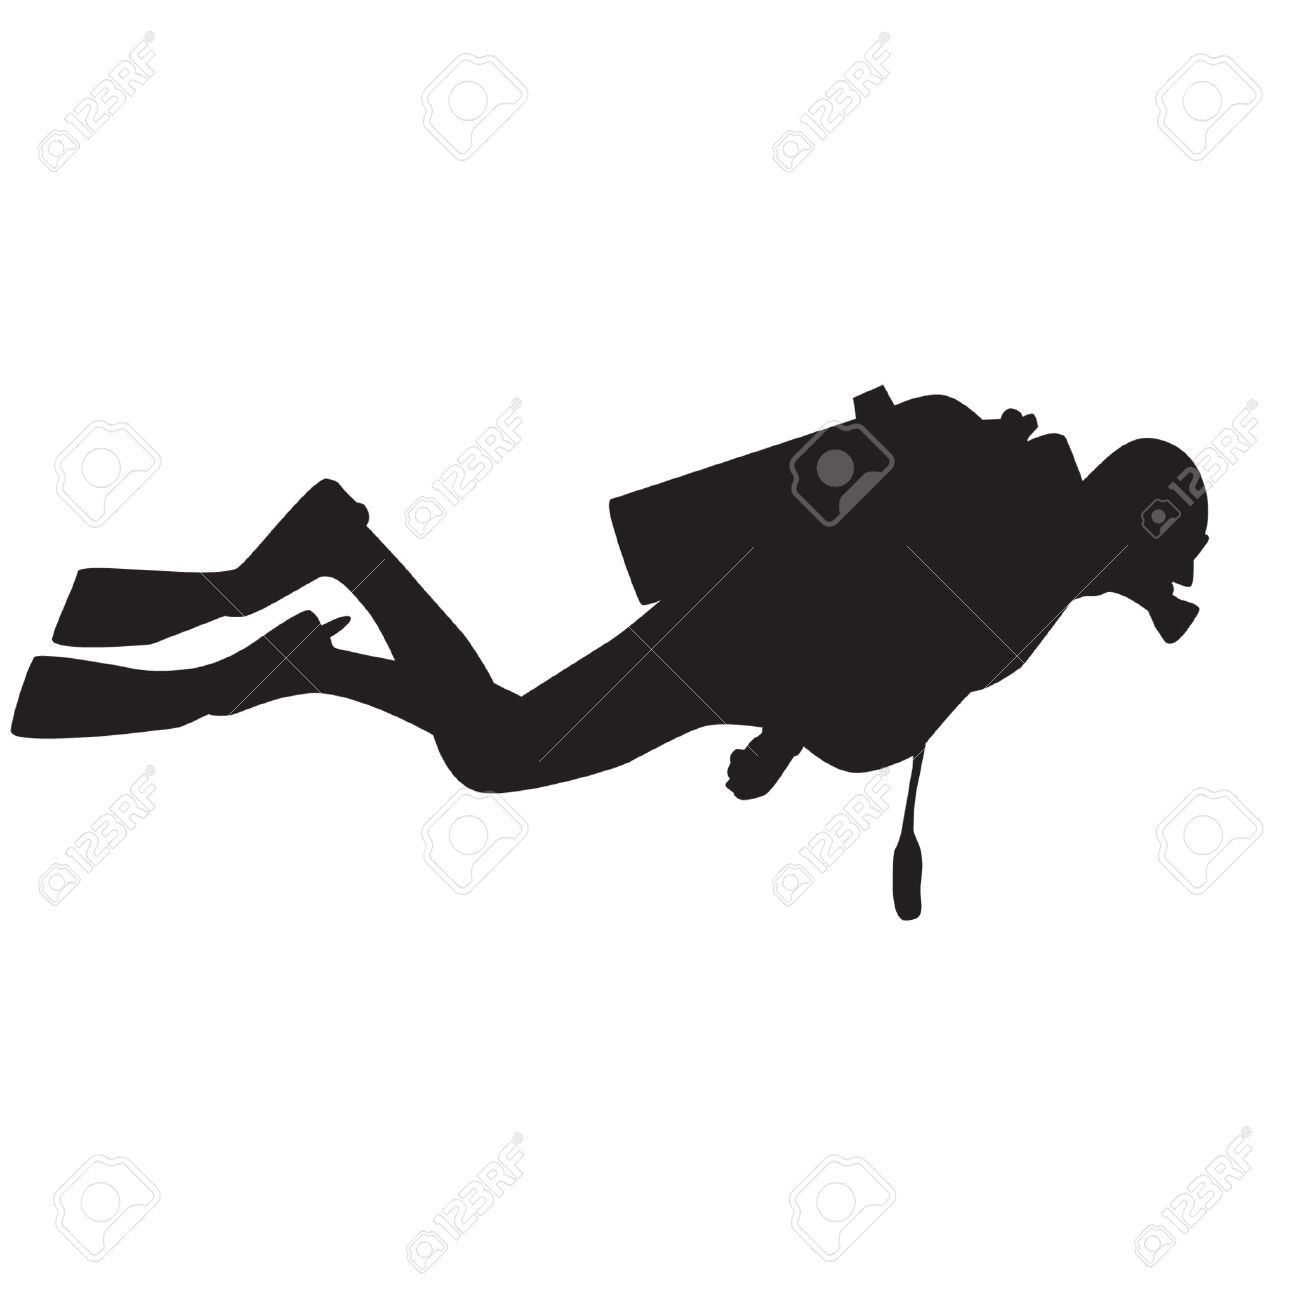 Image Gallery scuba silhouette.